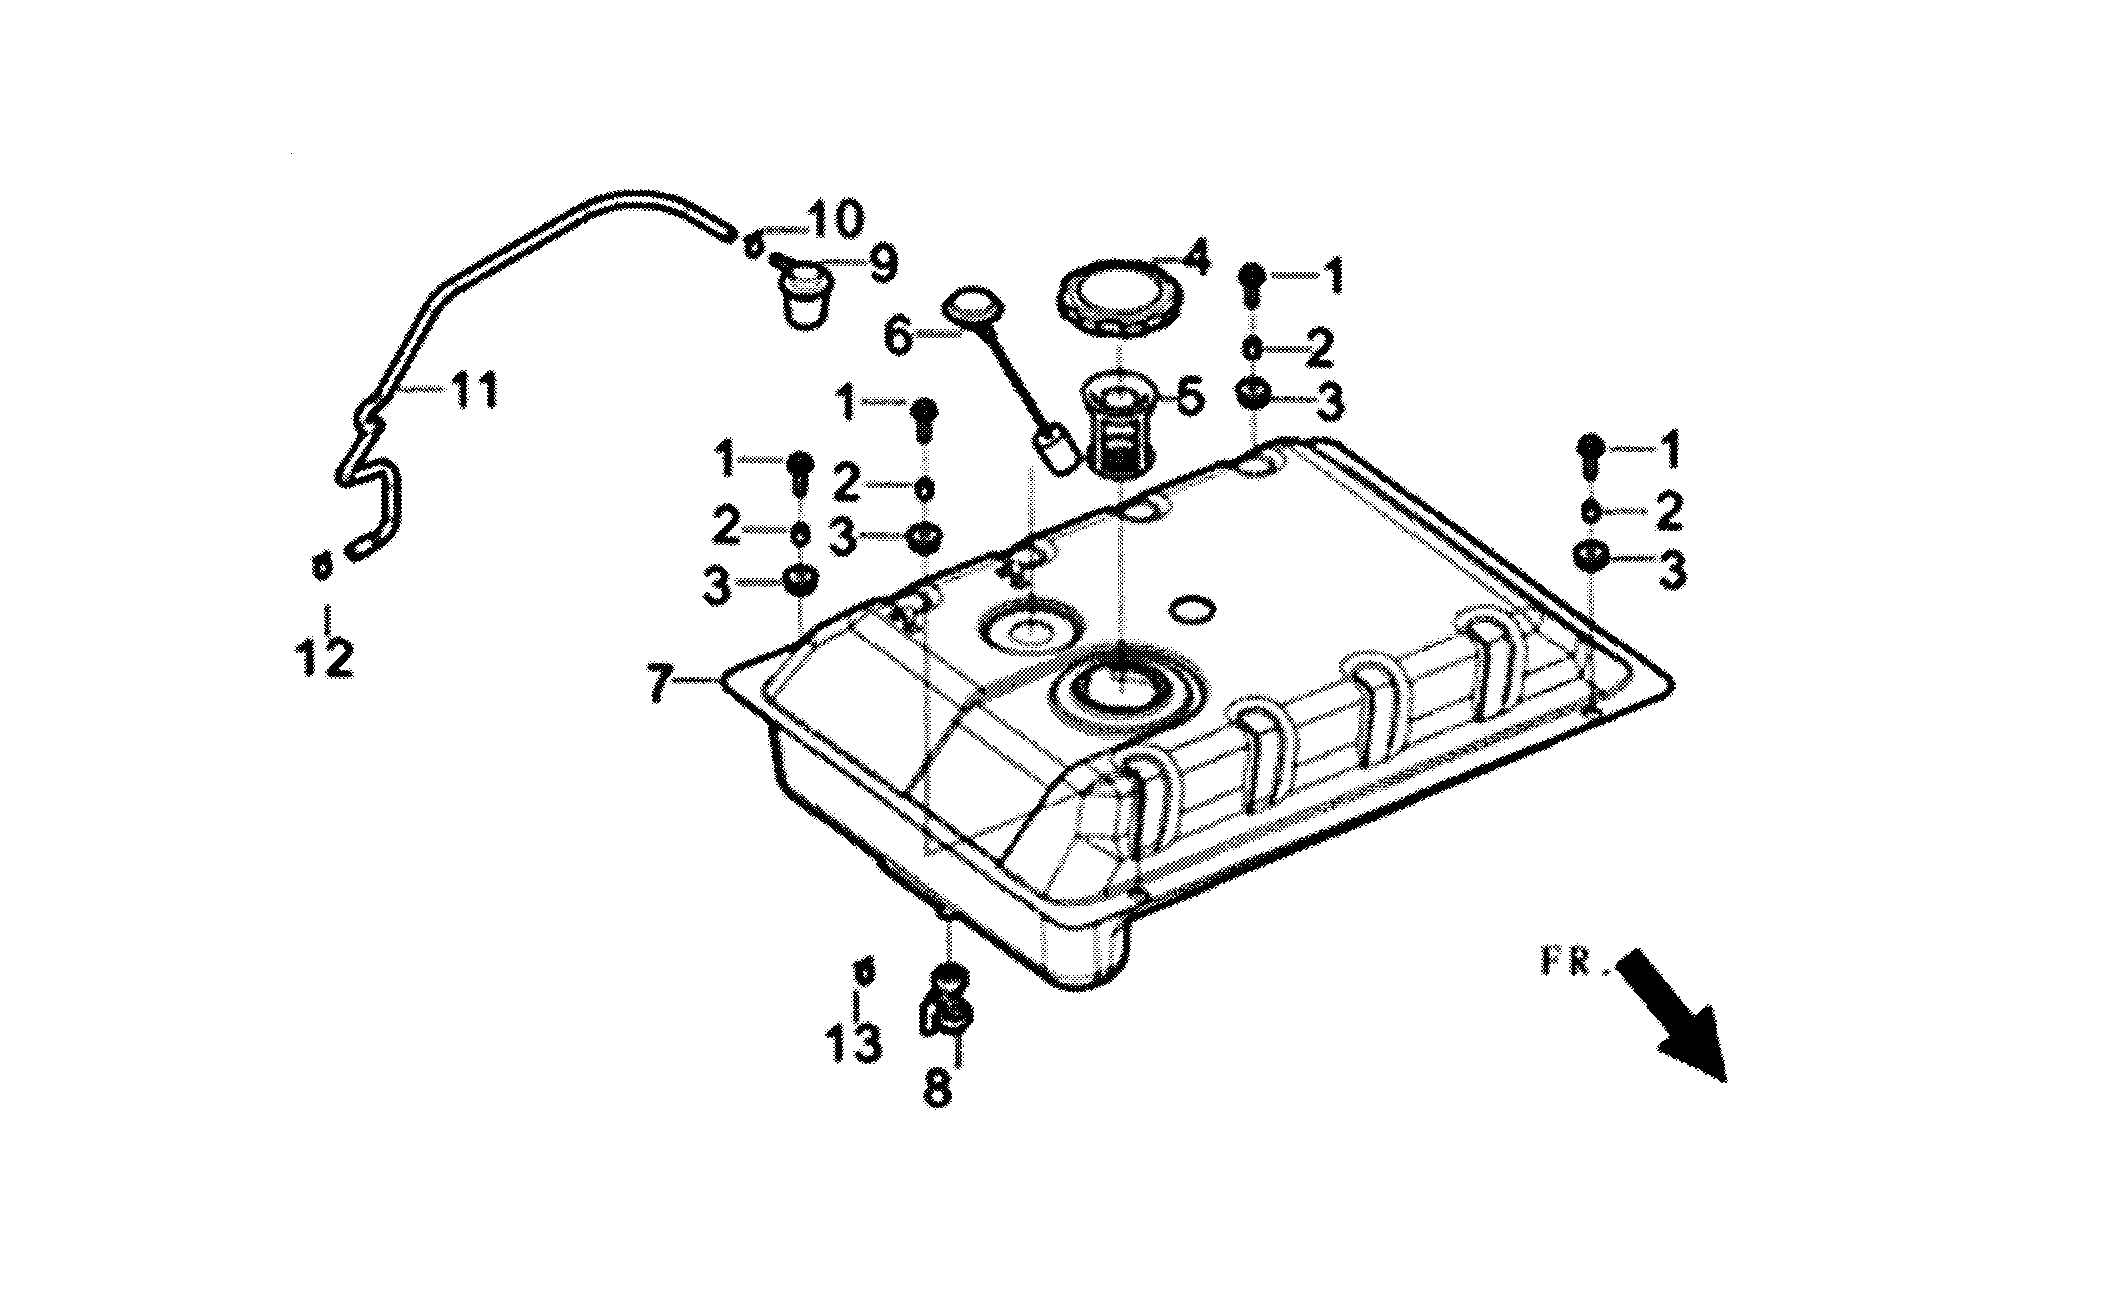 Wiring Diagram Diagram Parts List For Model 13150